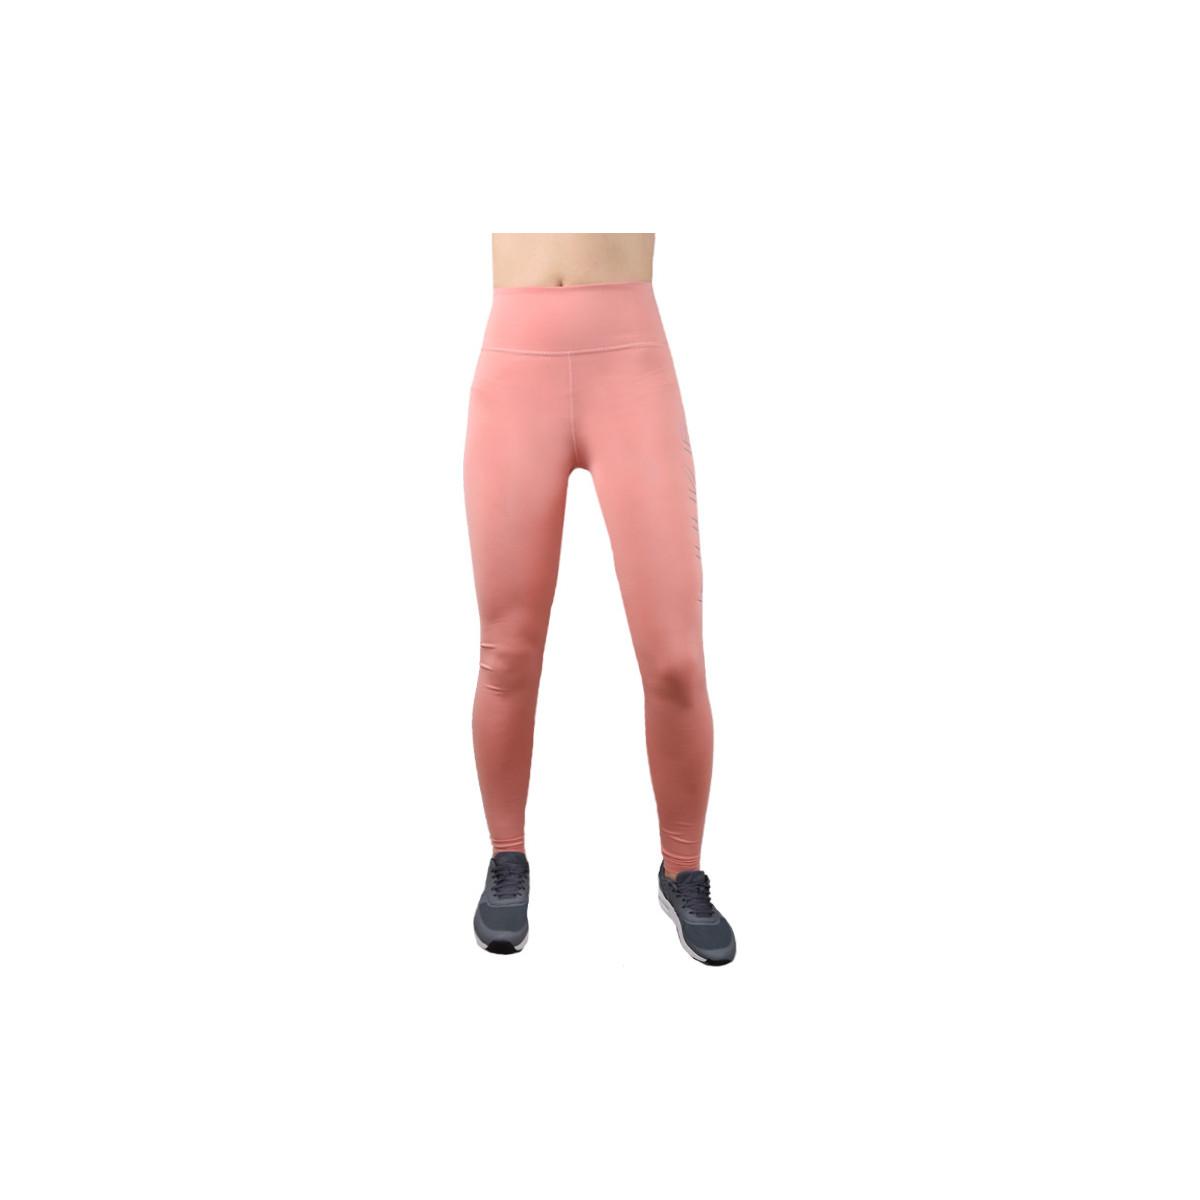 Strømpebukser Nike  Swoosh Pink BV4767-606